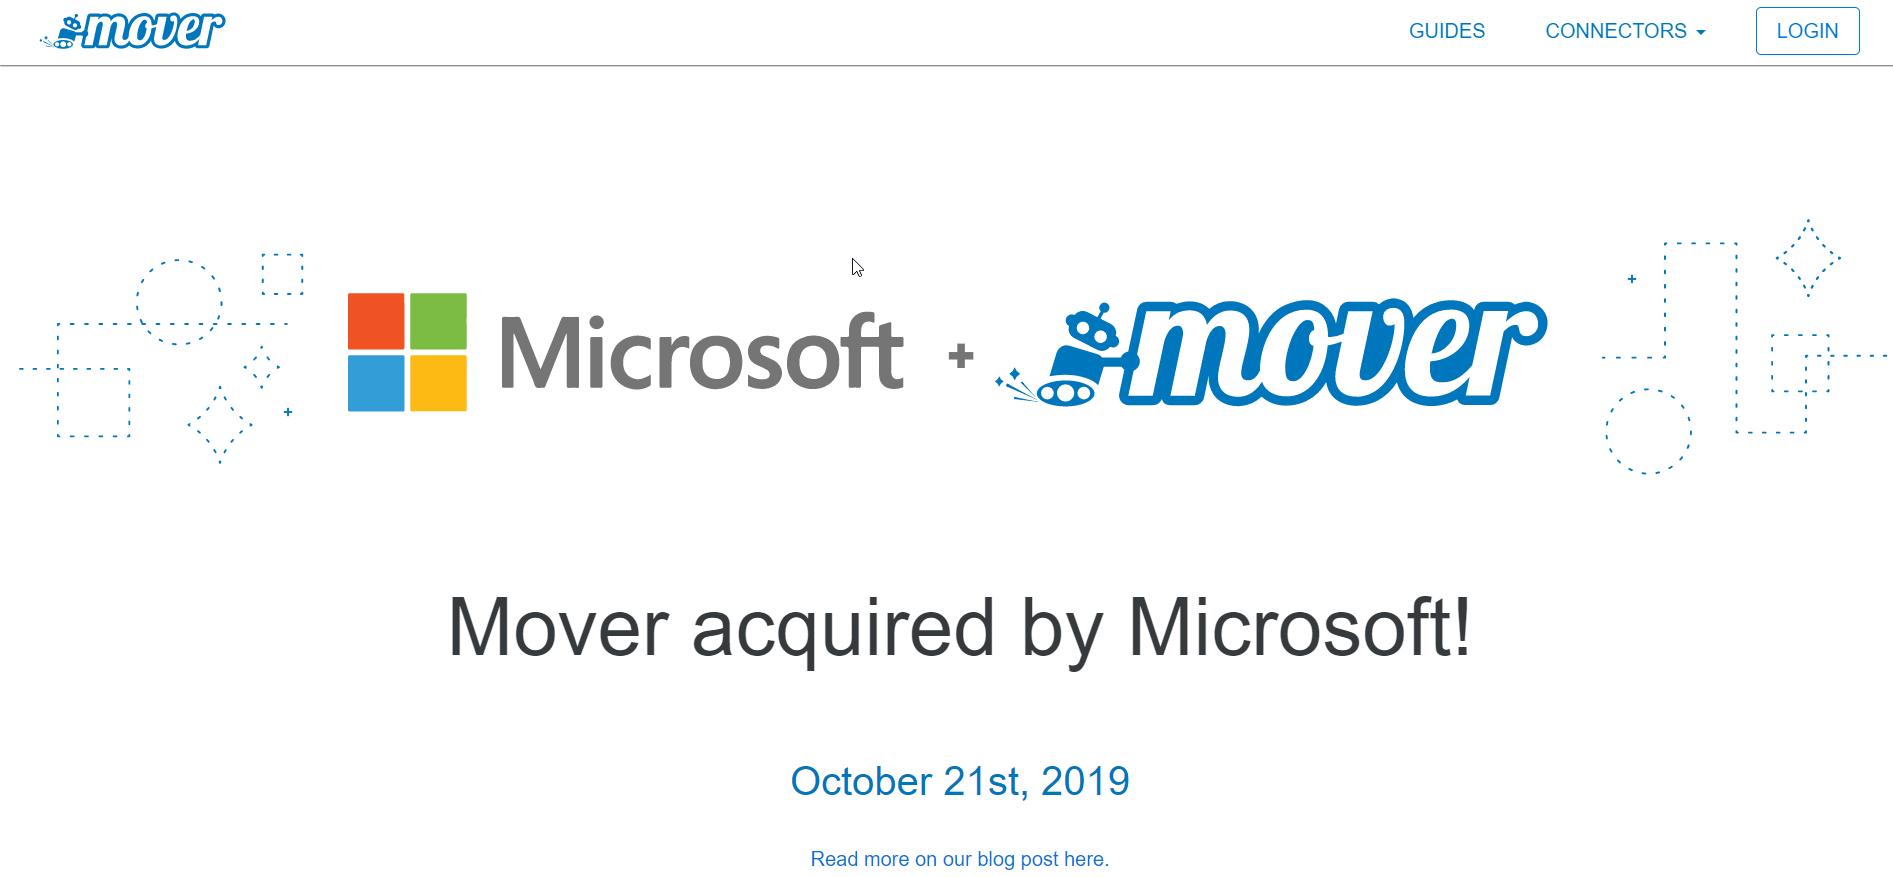 使用Mover.io跨账号批量迁移Onedrive文件